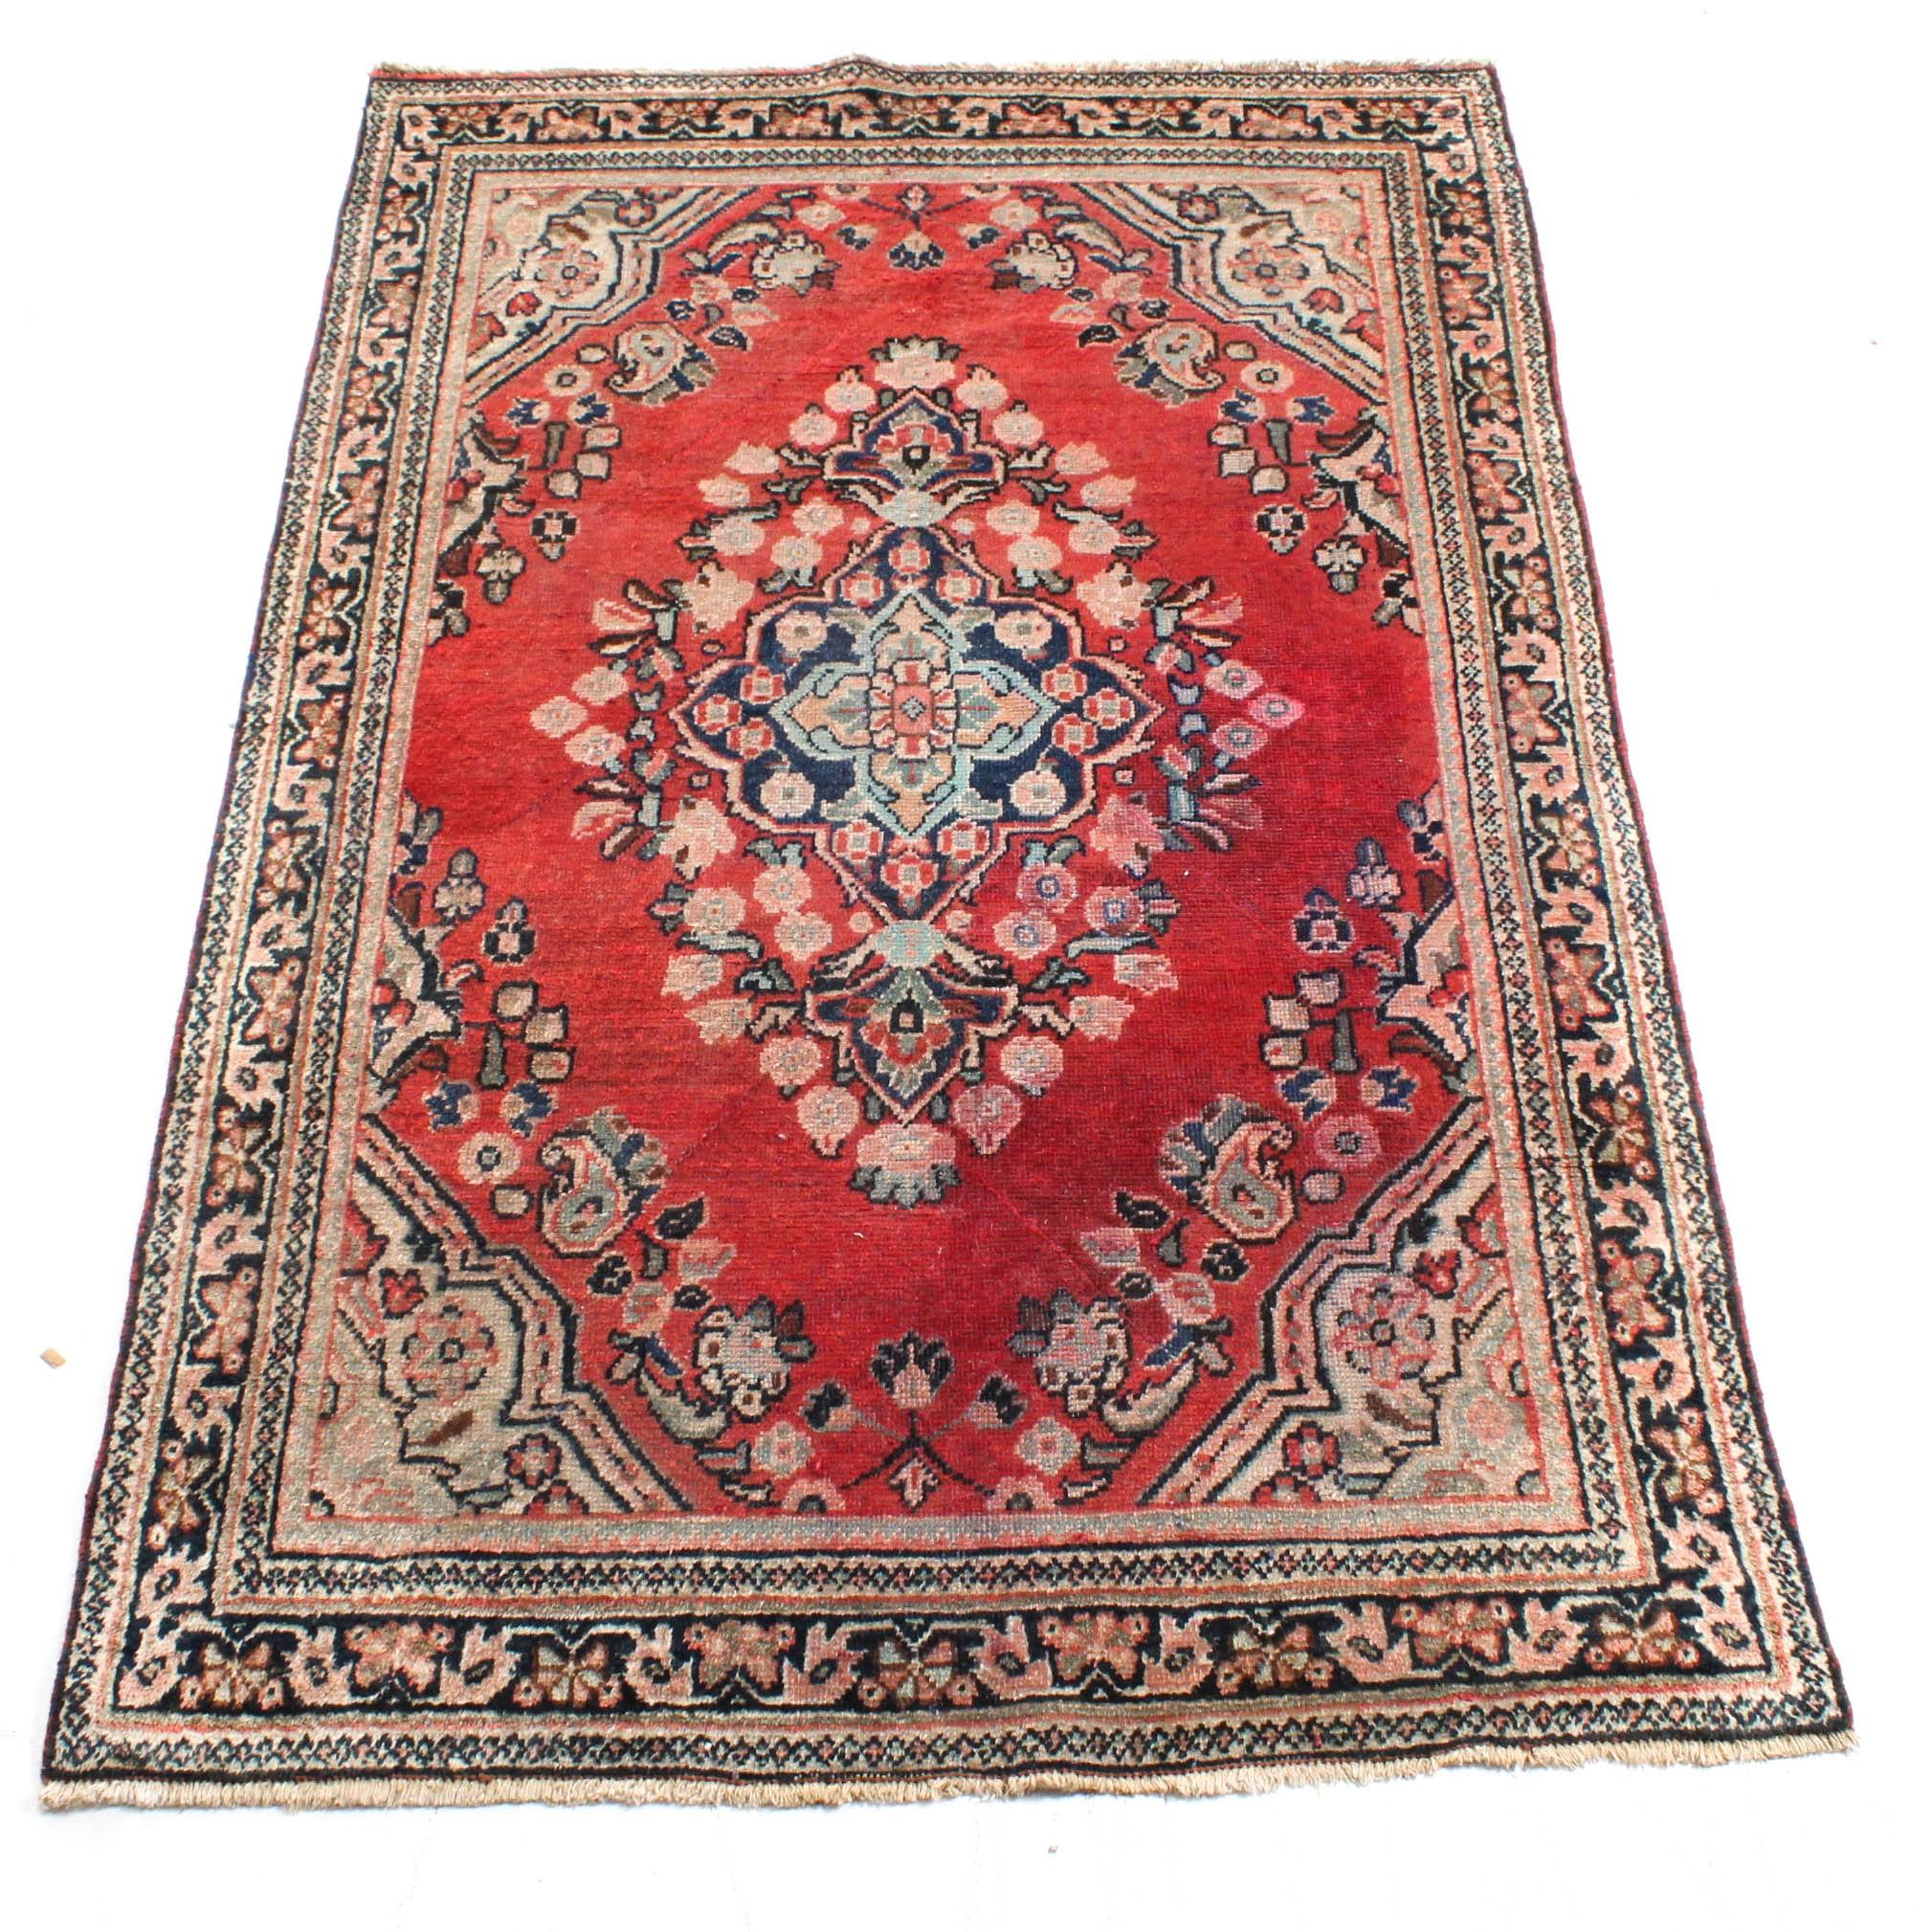 Vintage Hand-Knotted Persian Mahal Sarouk Rug